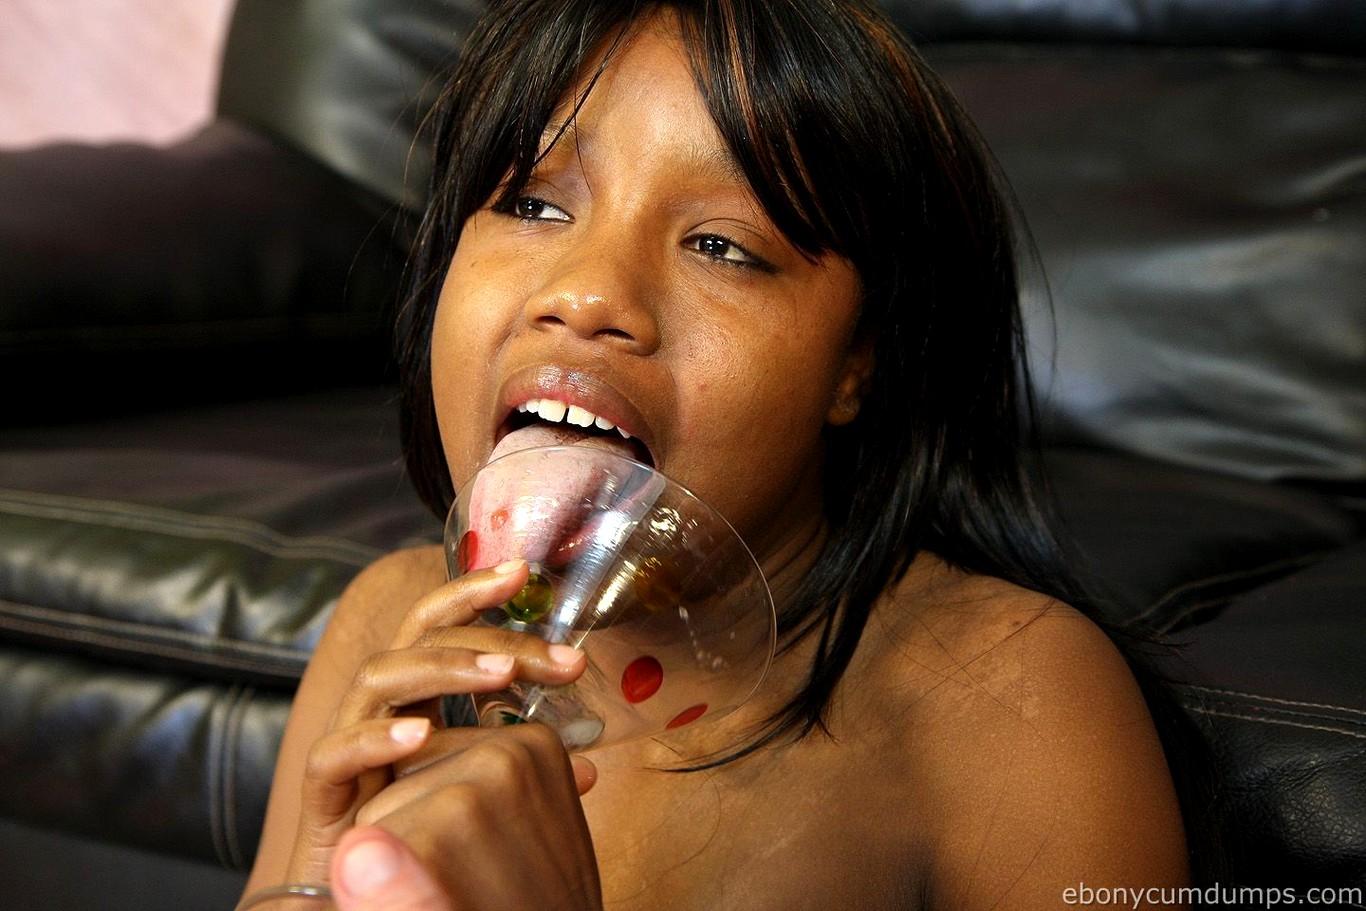 ebony-cum-dumps-free-vids-full-frontal-nudity-girl